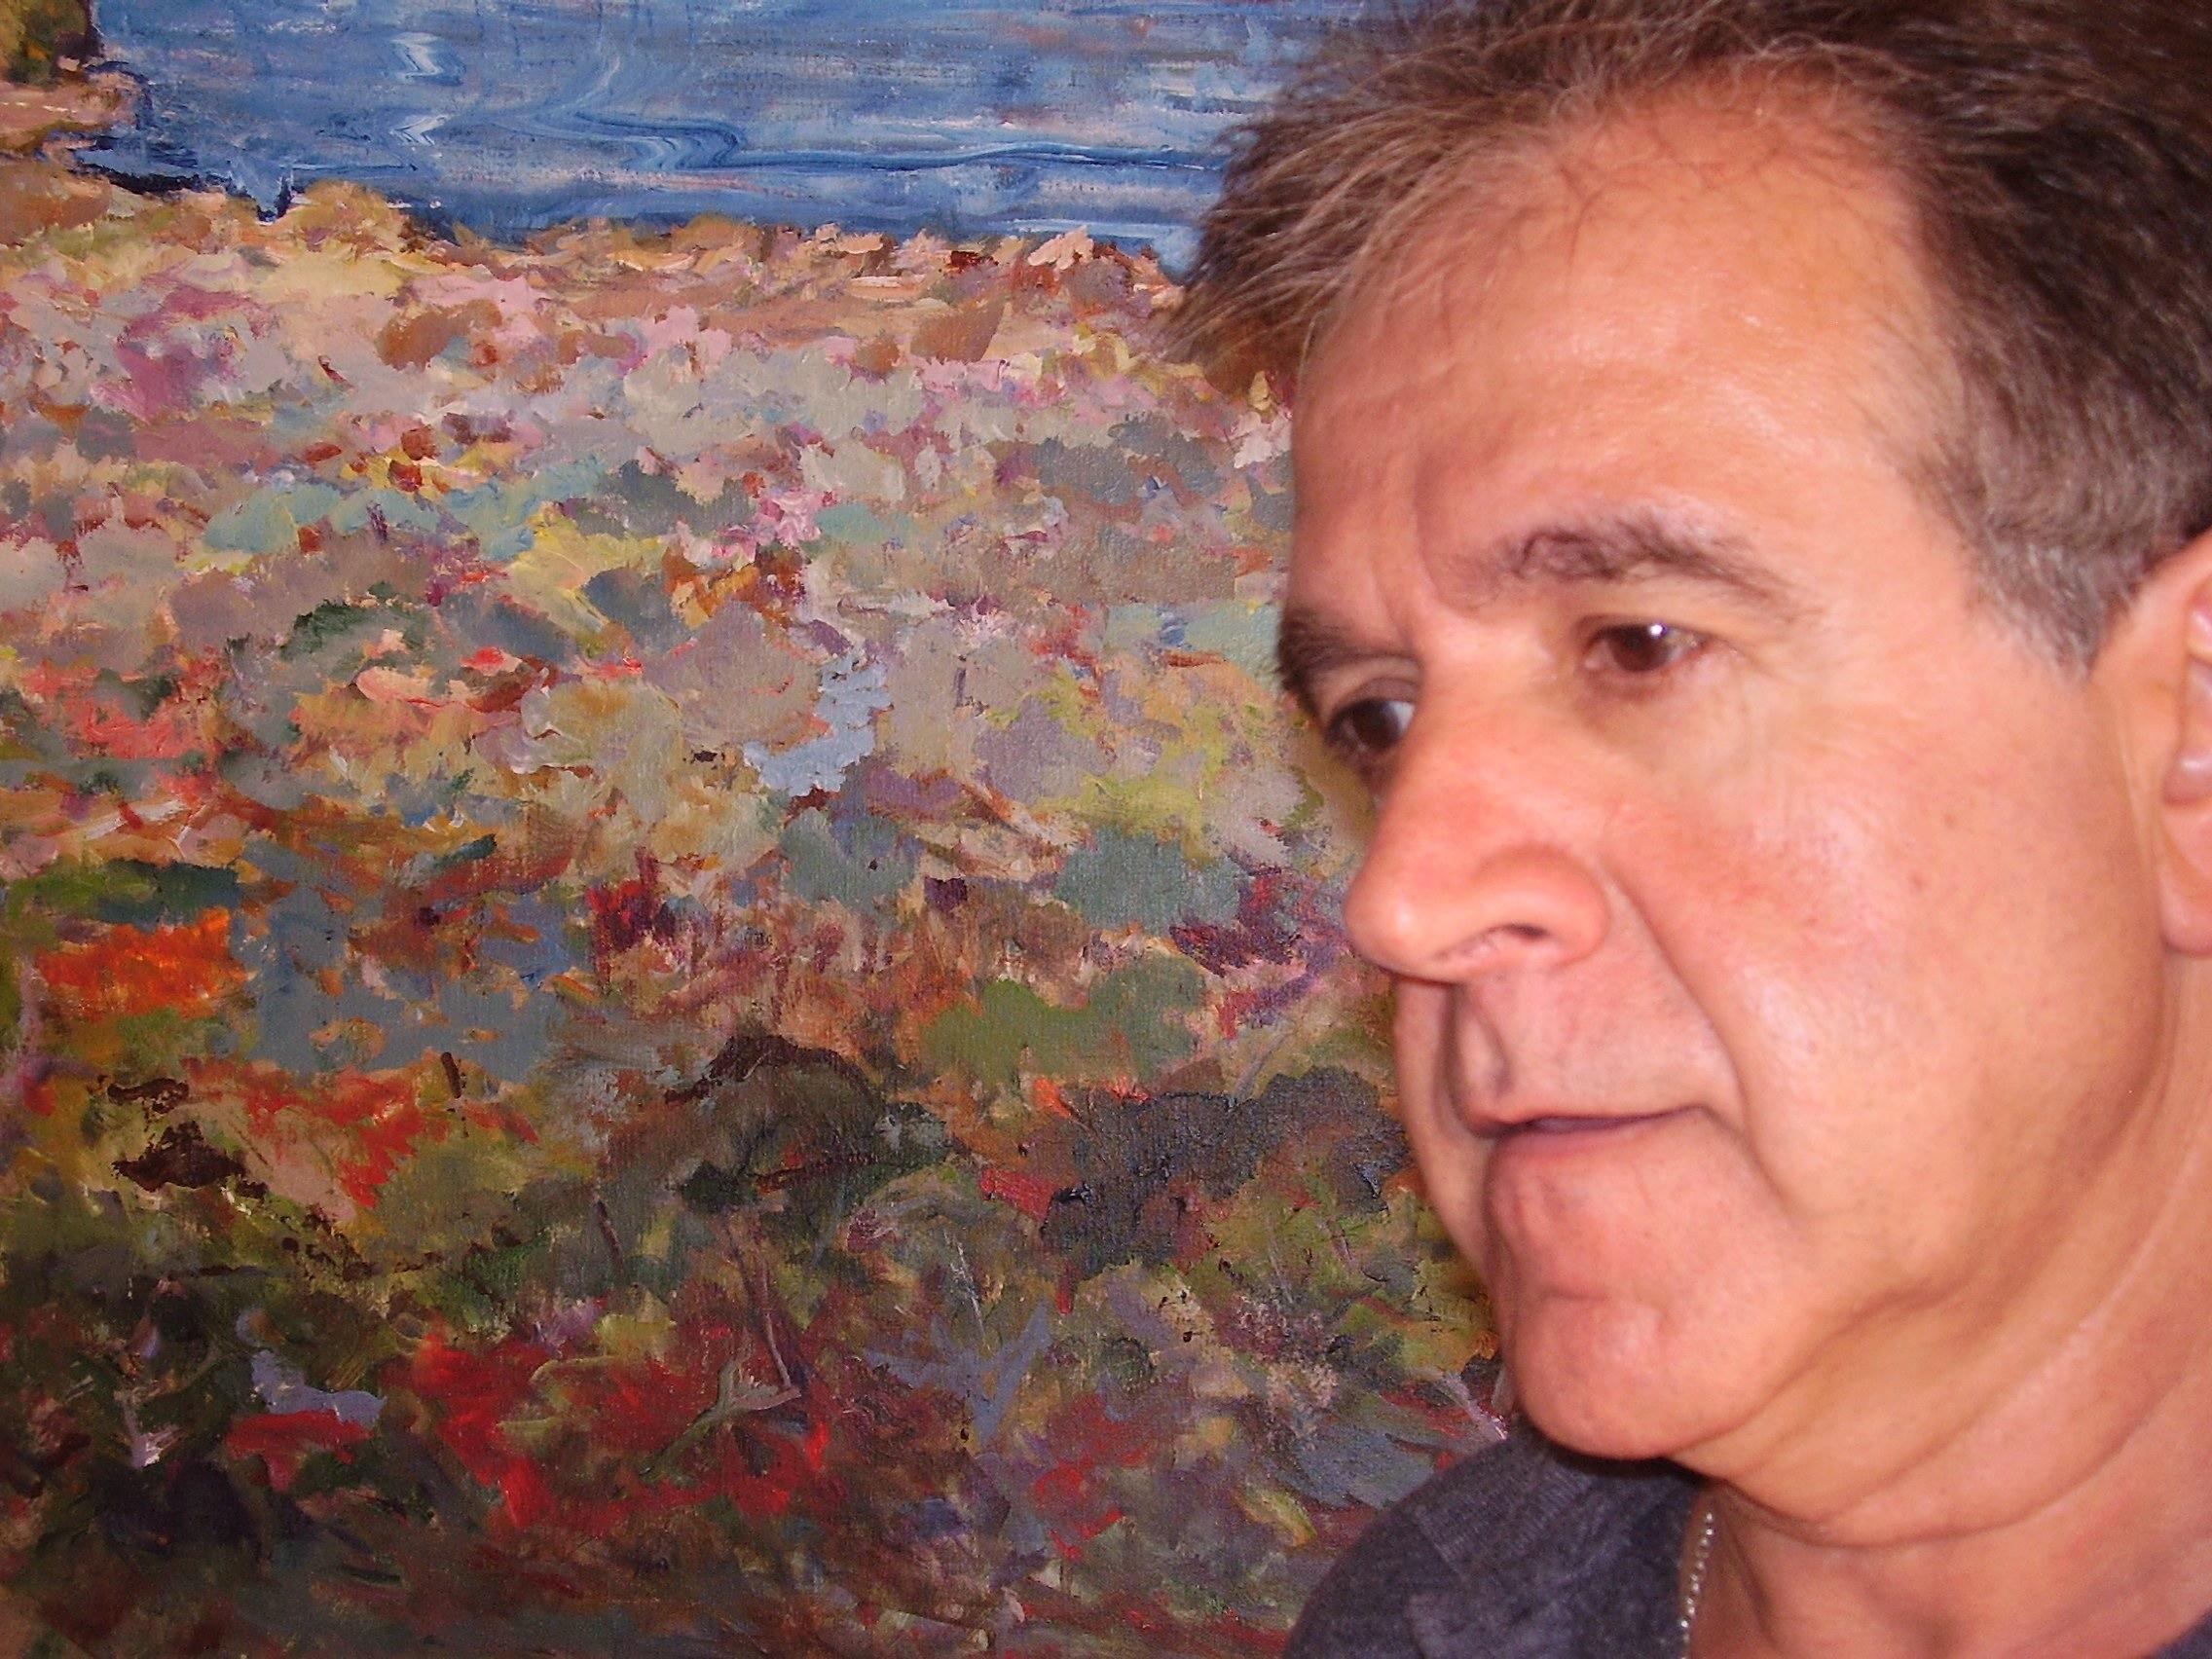 Exposici de pintura de jaume crespiera r dio sant fruit s - Pintur sant fruitos ...